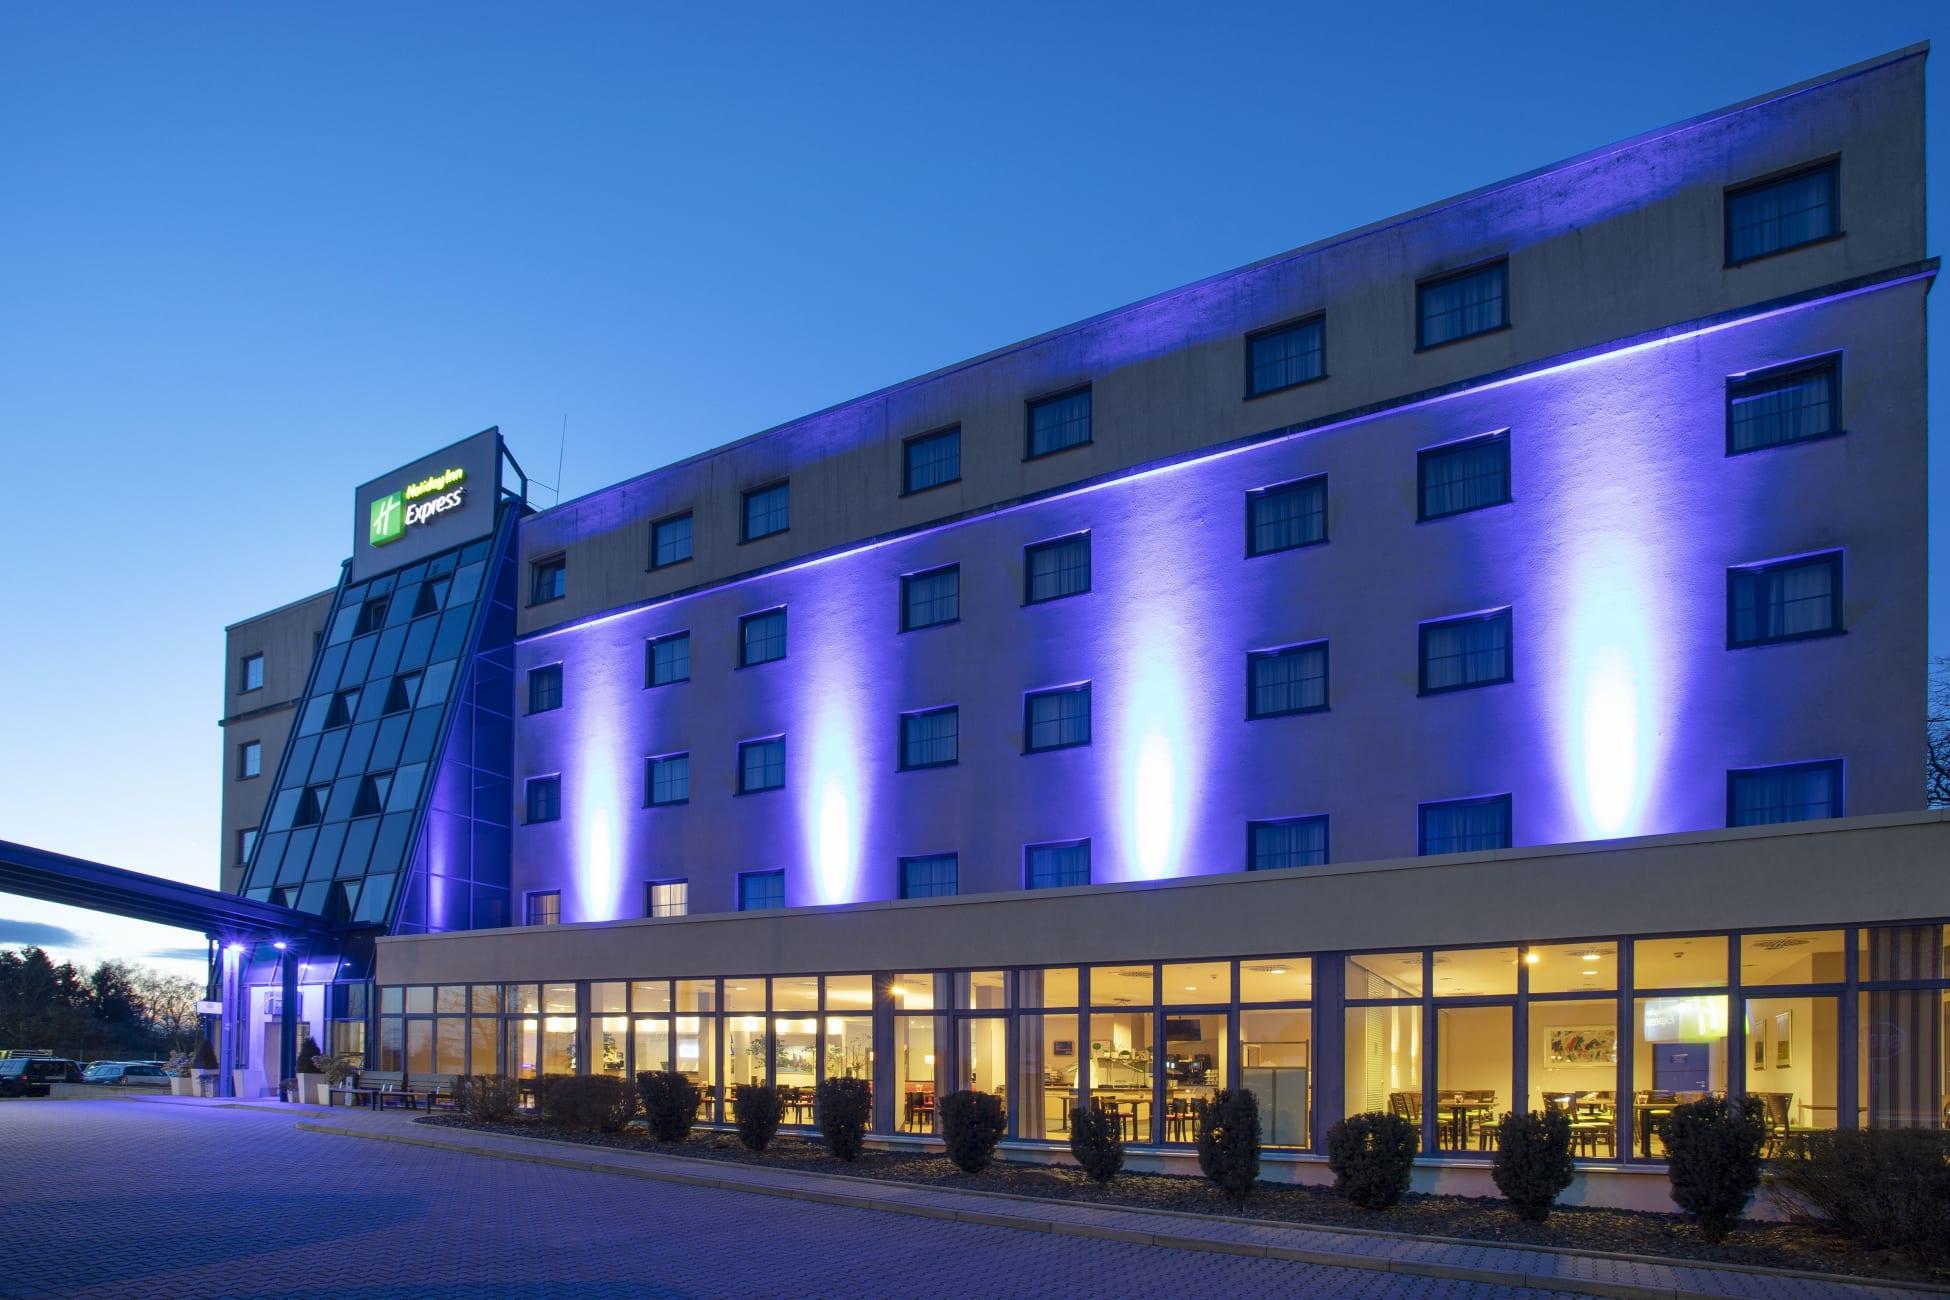 Hotel Holiday Inn Express Frankfurt Airport Morfelden